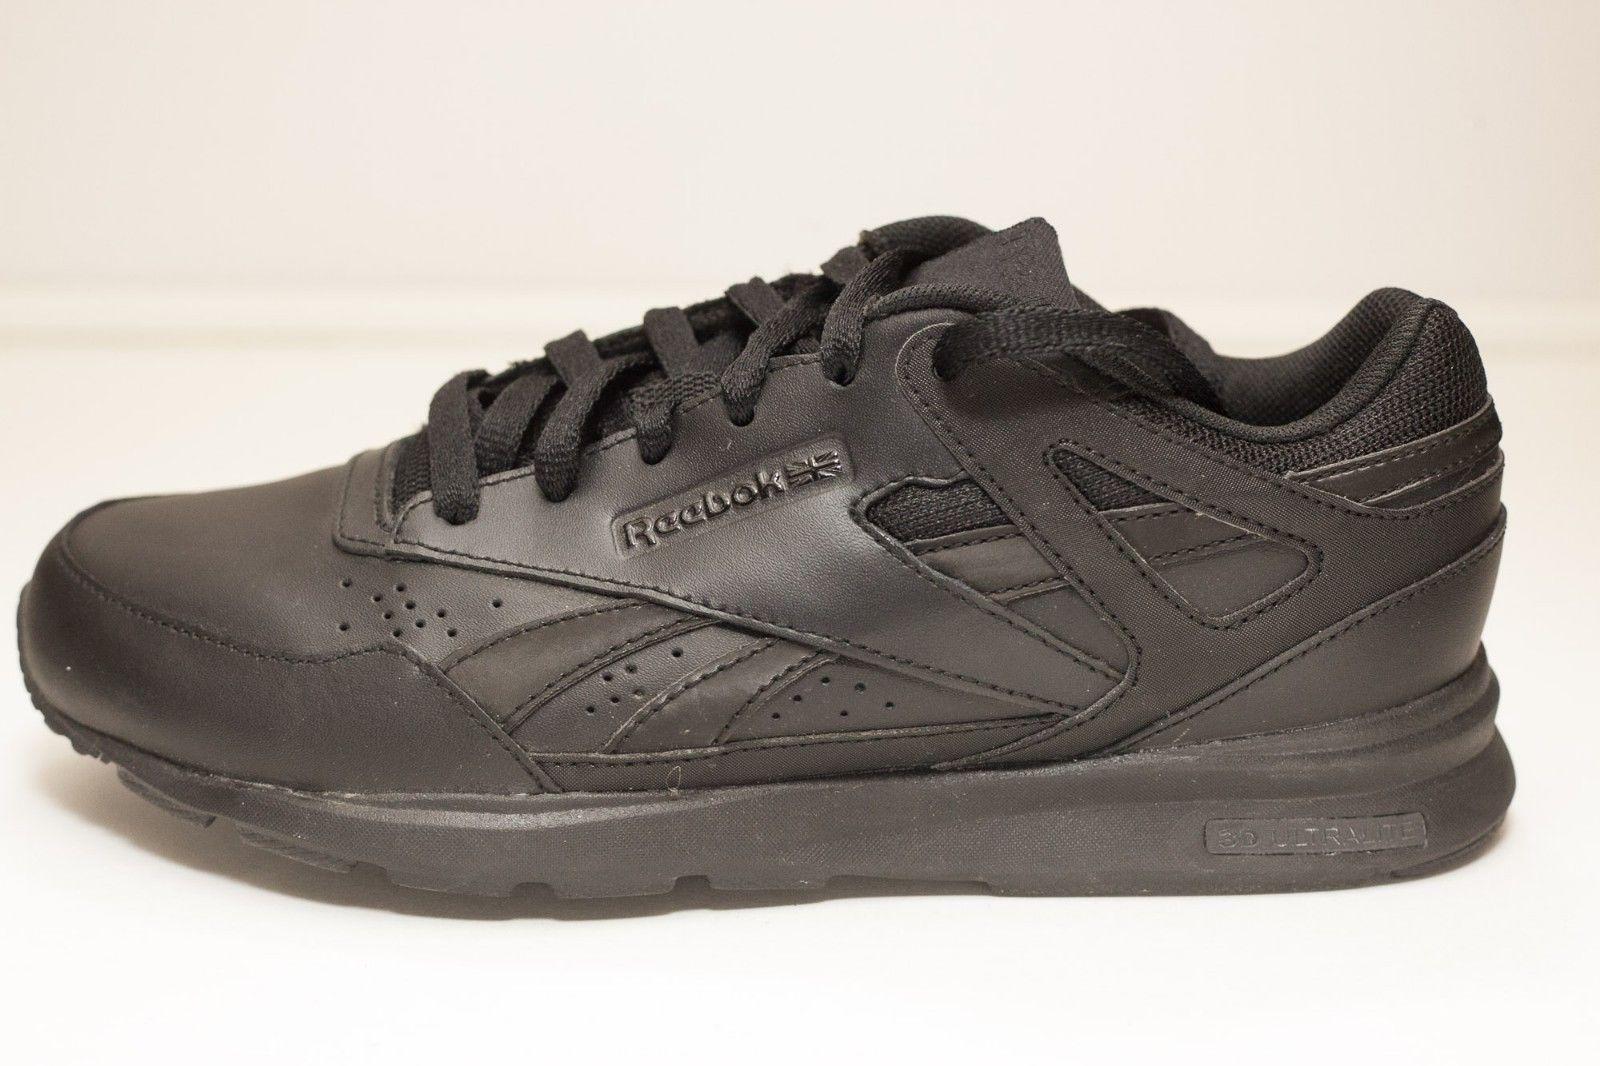 a2e7e64c67d Reebok Size 7.5 D Black Walking Shoes Women s and 50 similar items